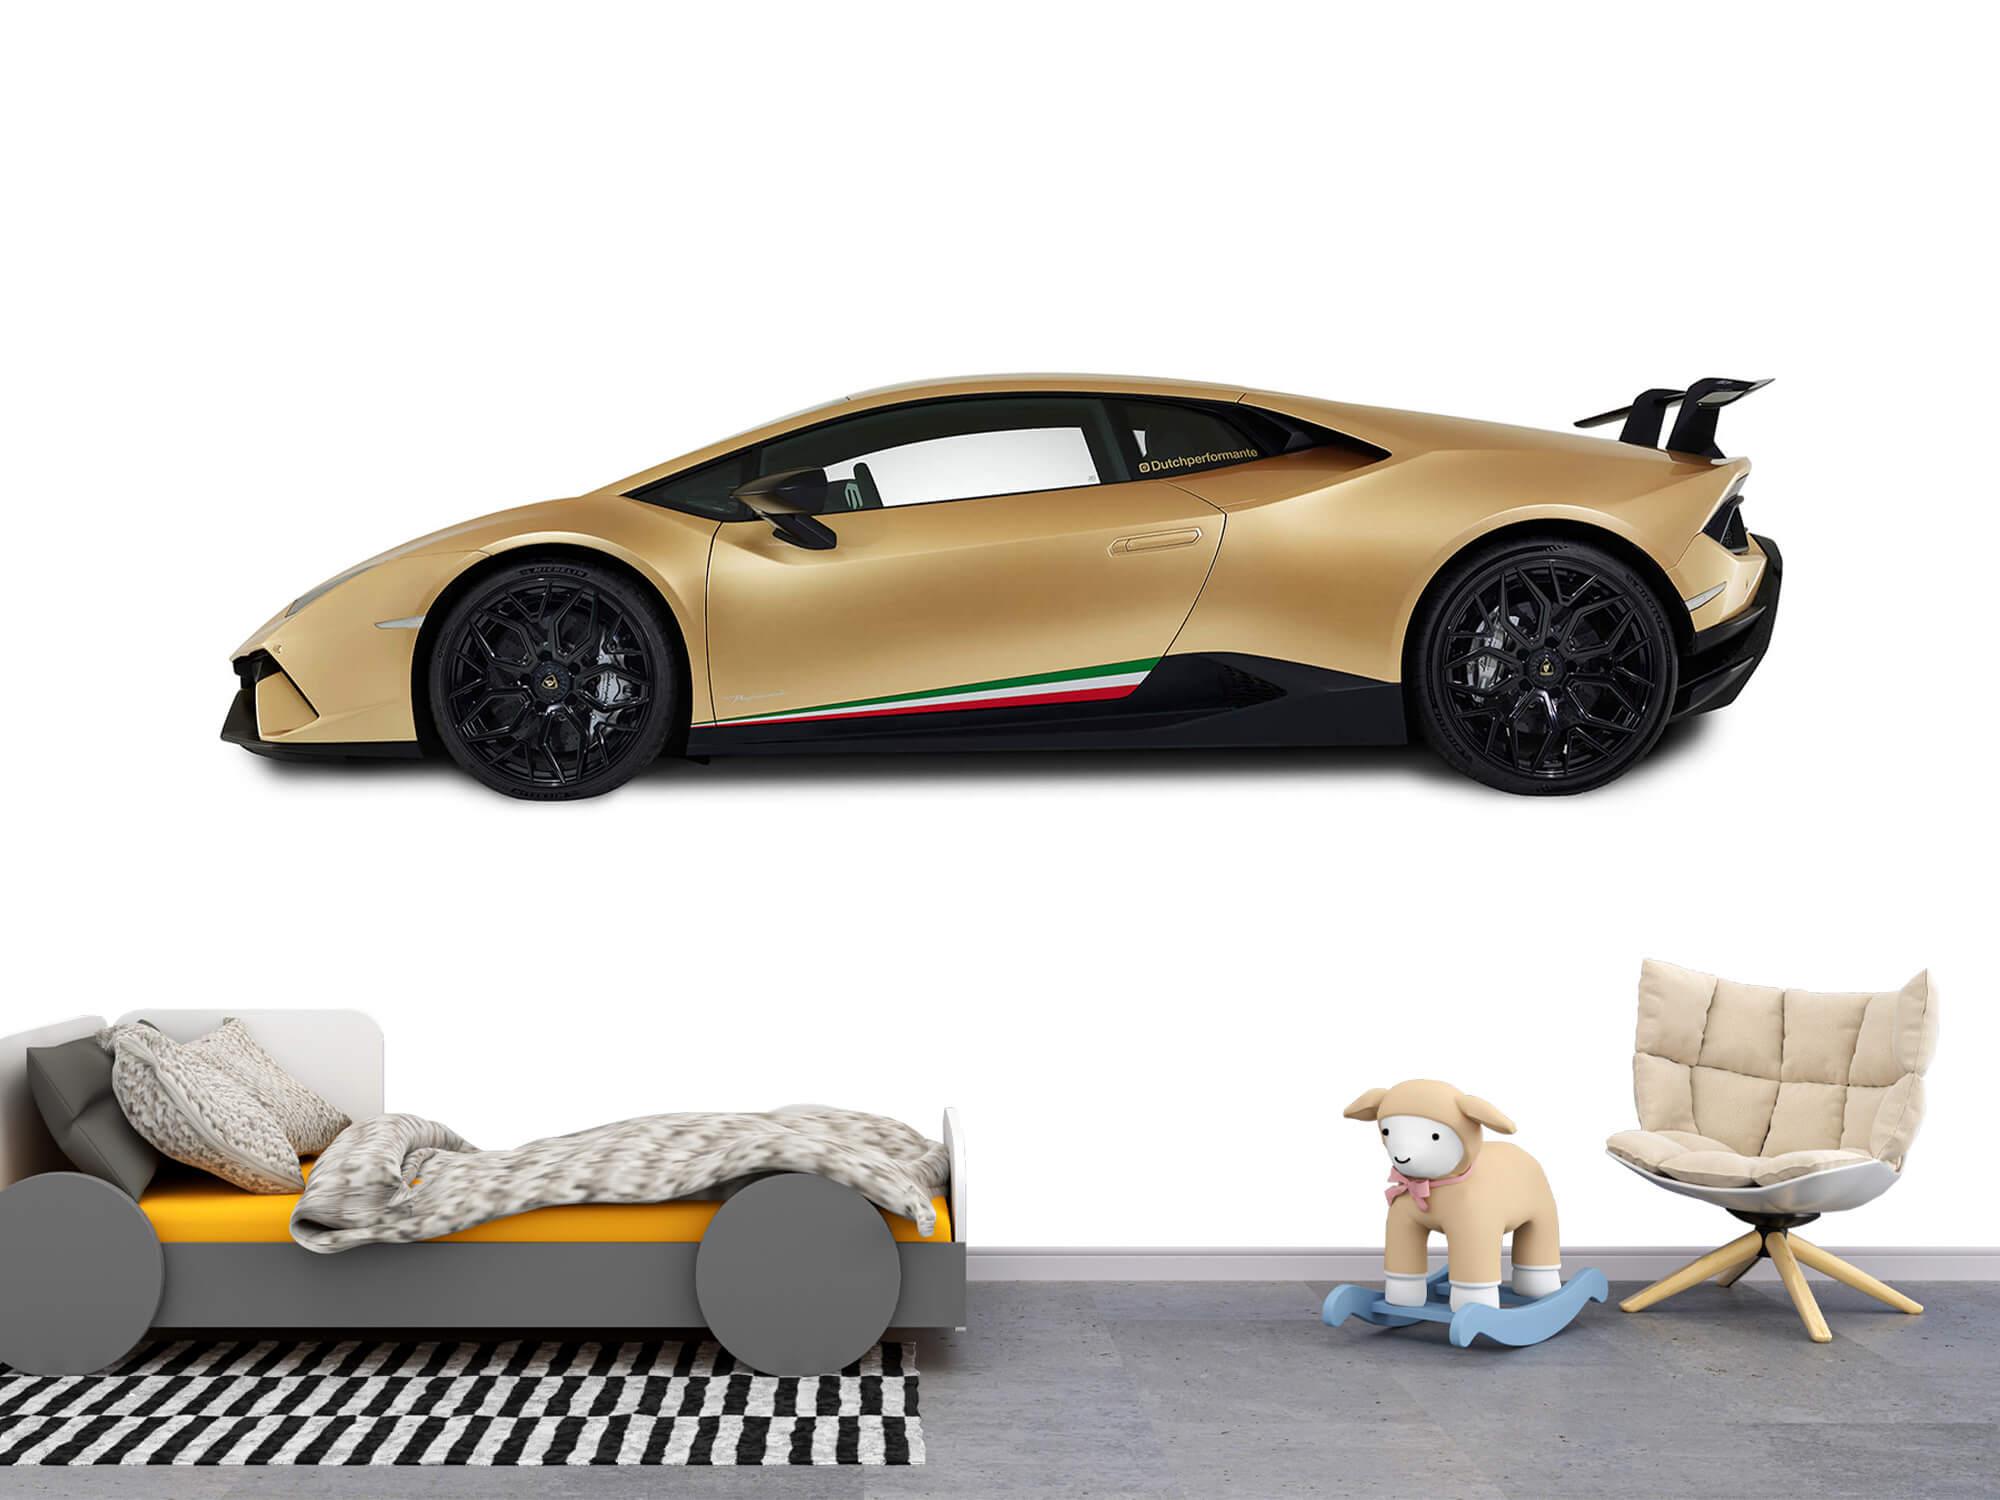 Wallpaper Lamborghini Huracán - Zijkant, wit 11